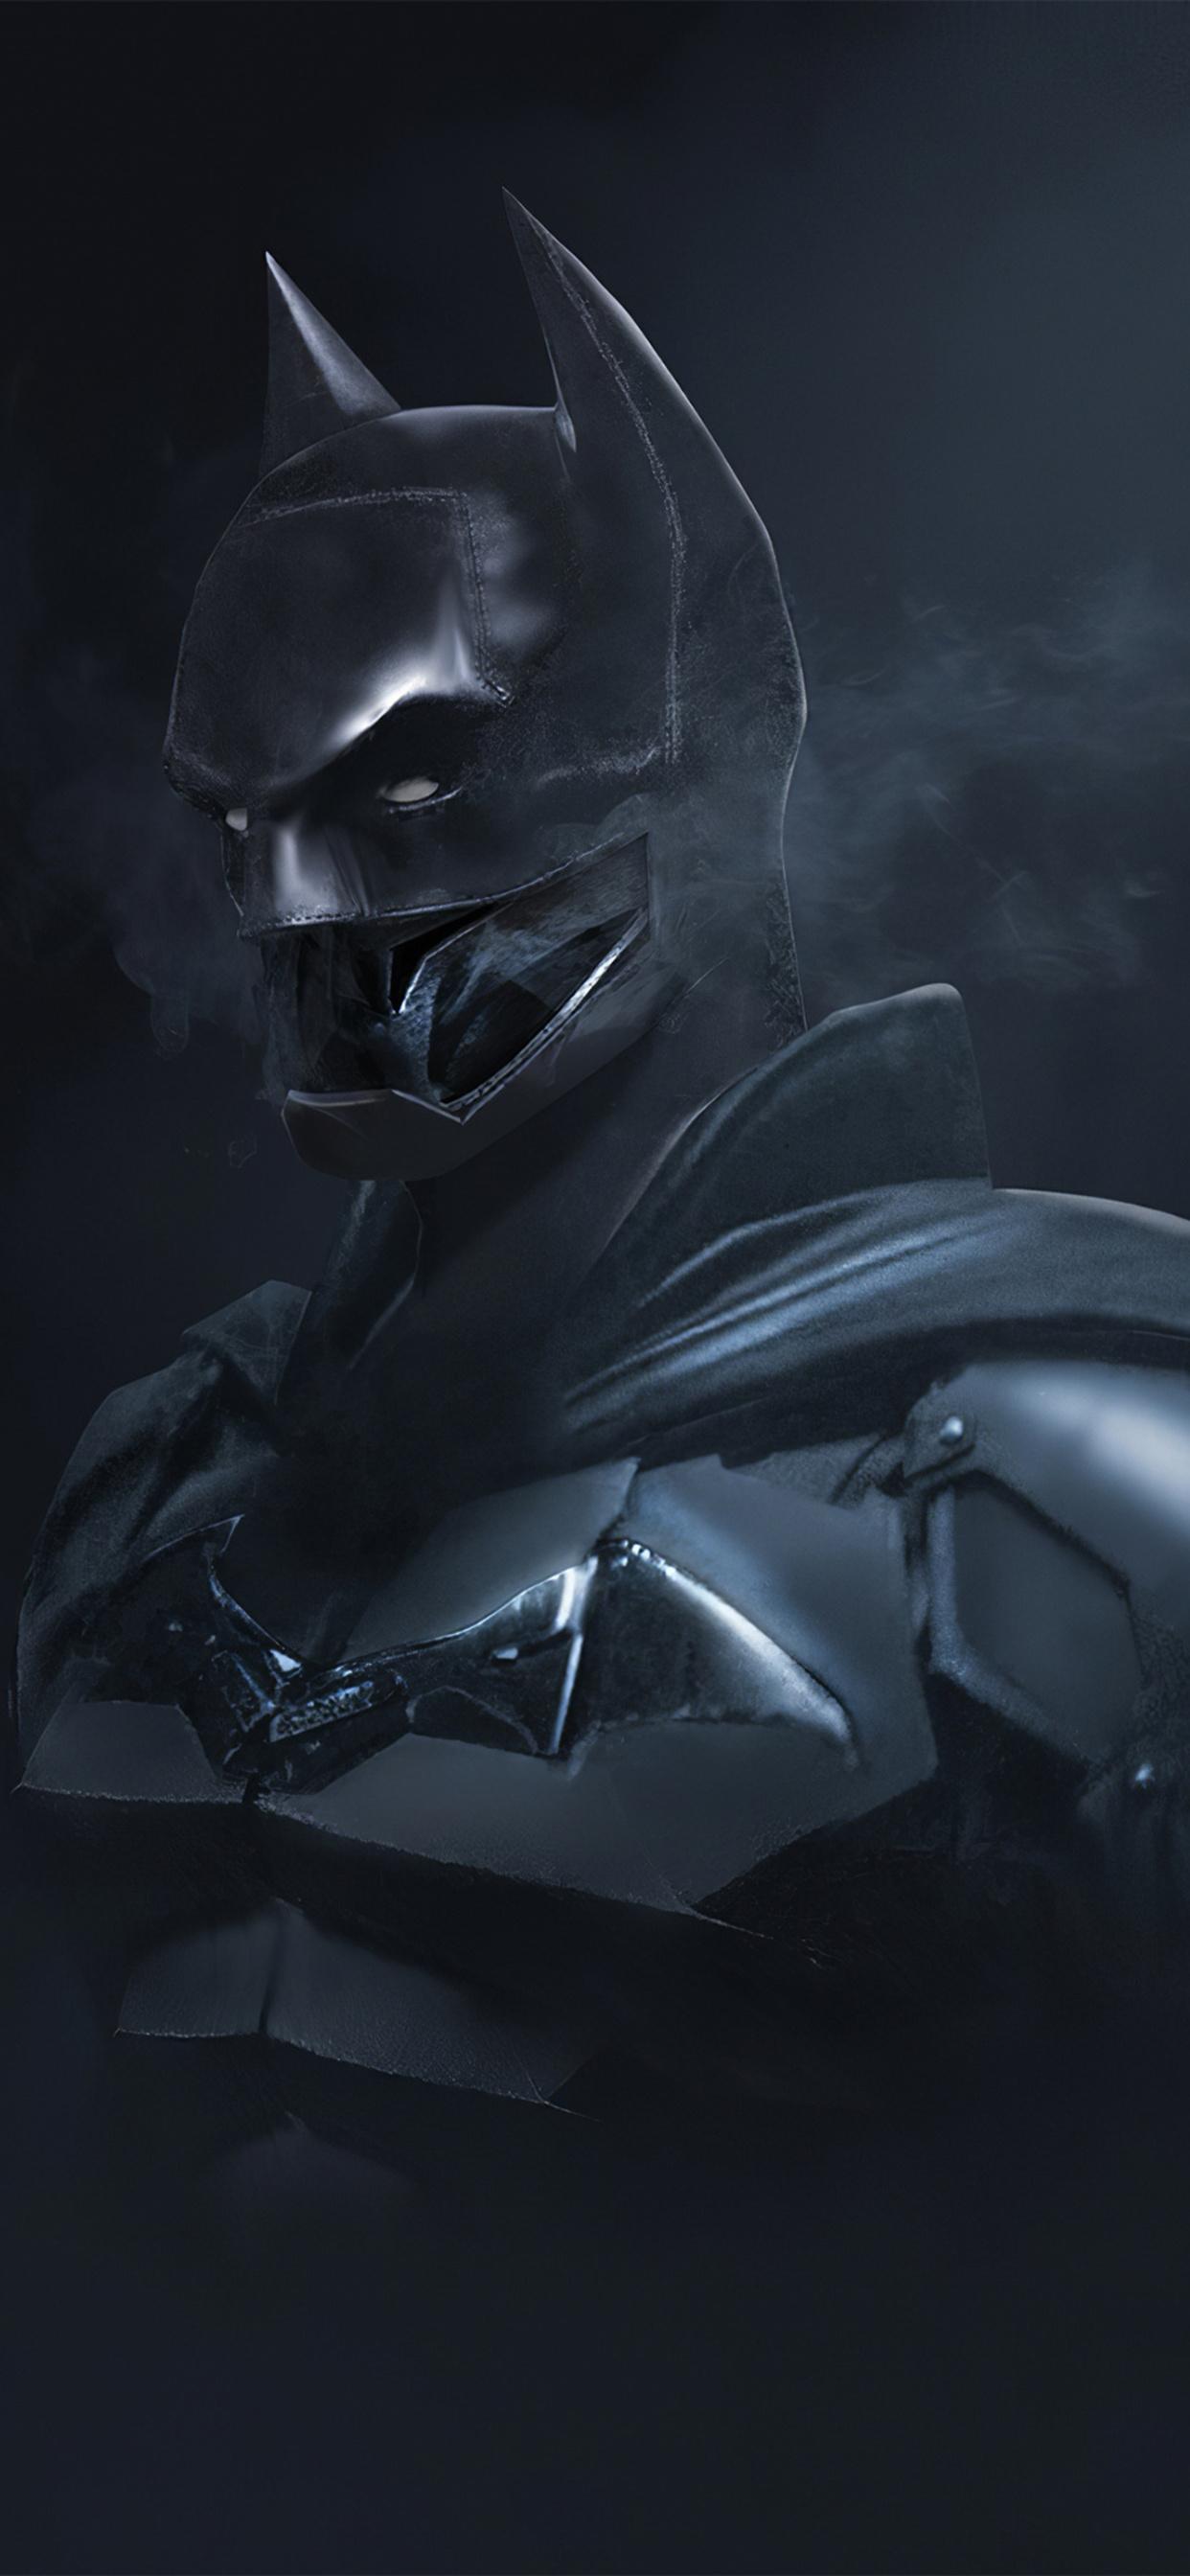 batman-new-suit-4k-yx.jpg